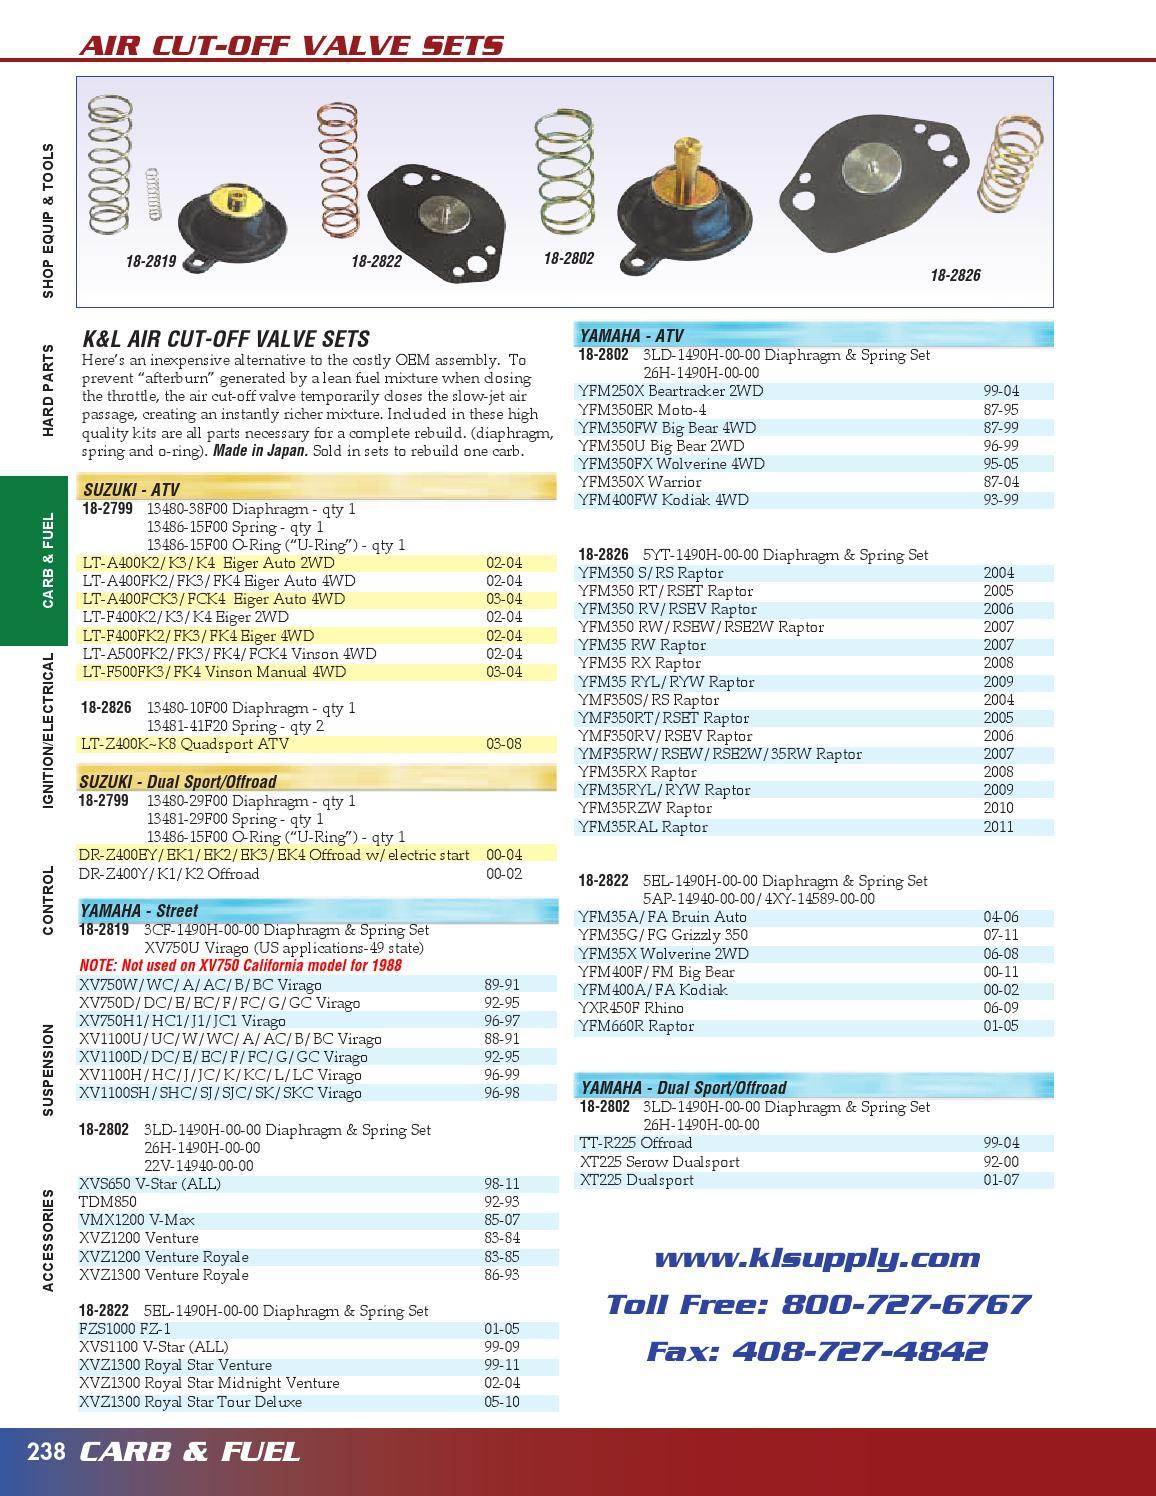 Yamaha Bruin Big Bear Kodiak Raptor K/&L Air Cut Off Valve 18-2822